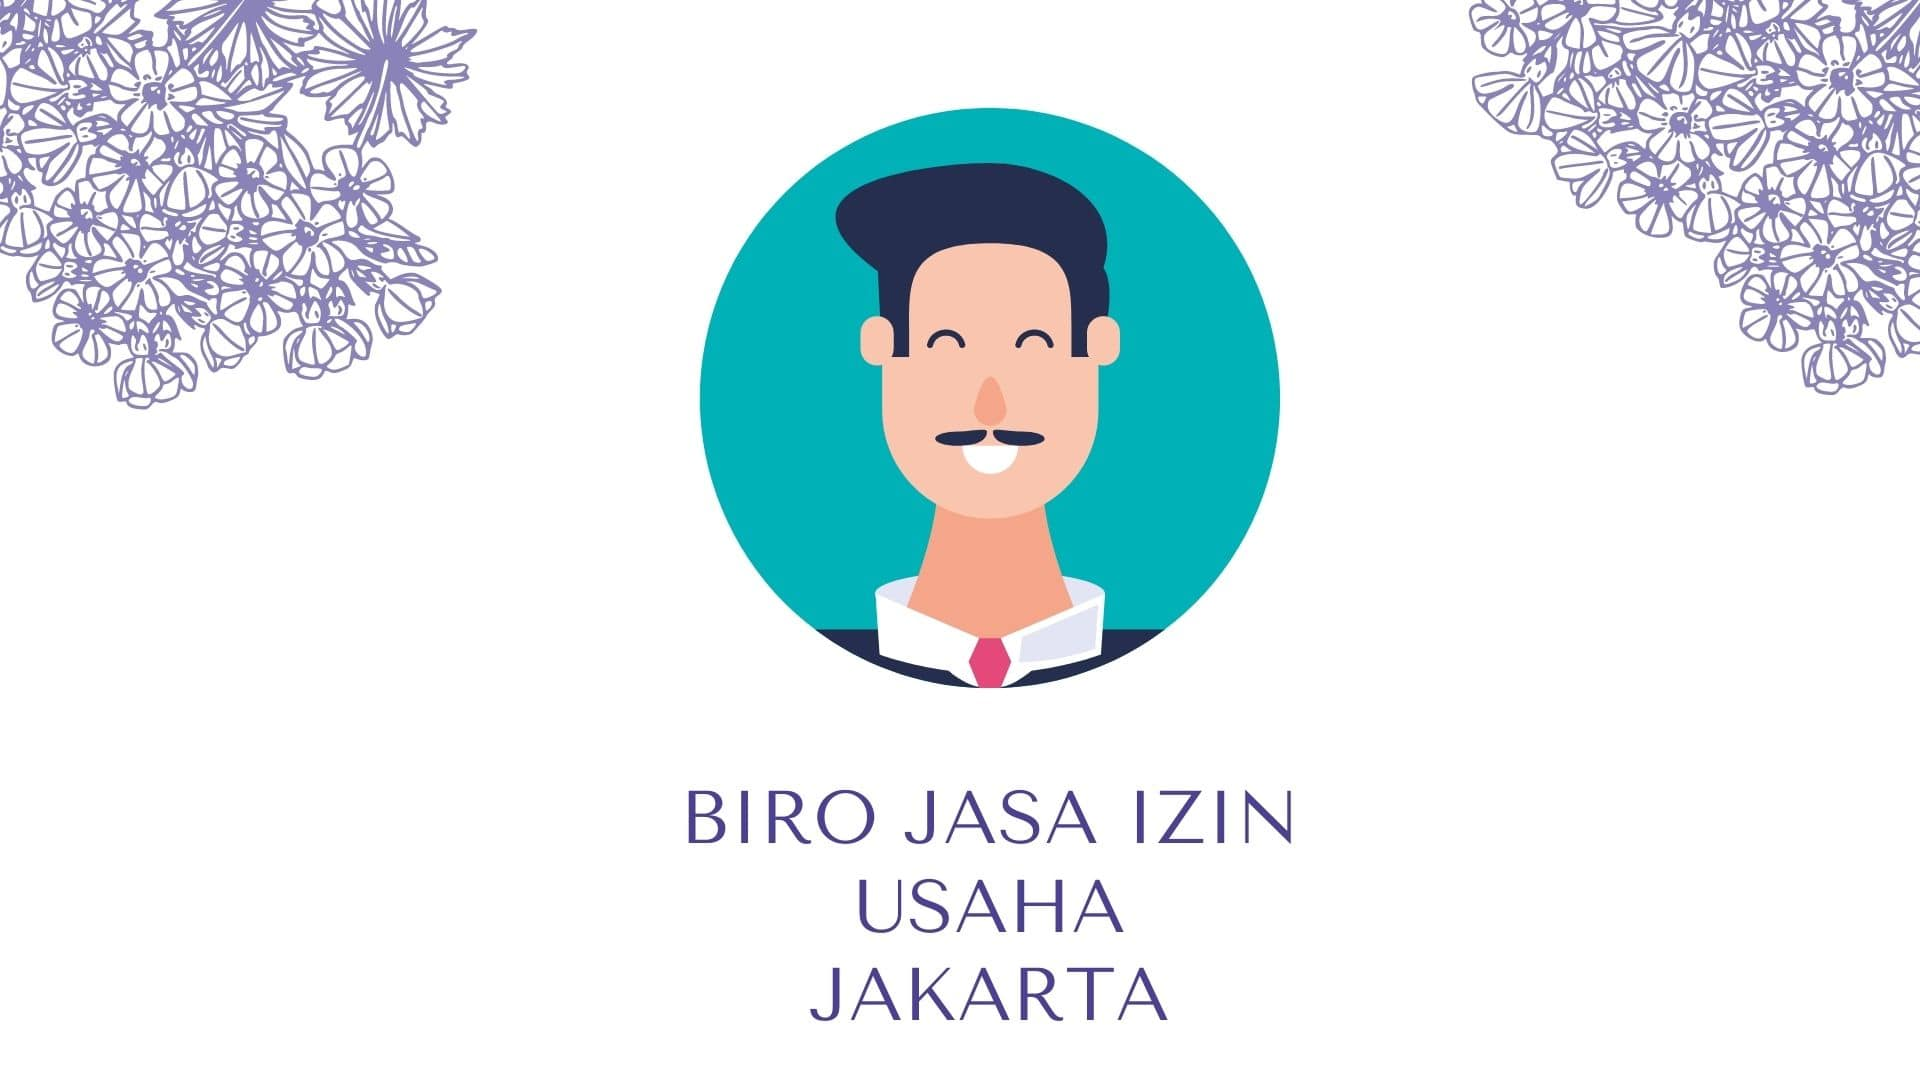 Biro Jasa Izin Usaha Jakarta